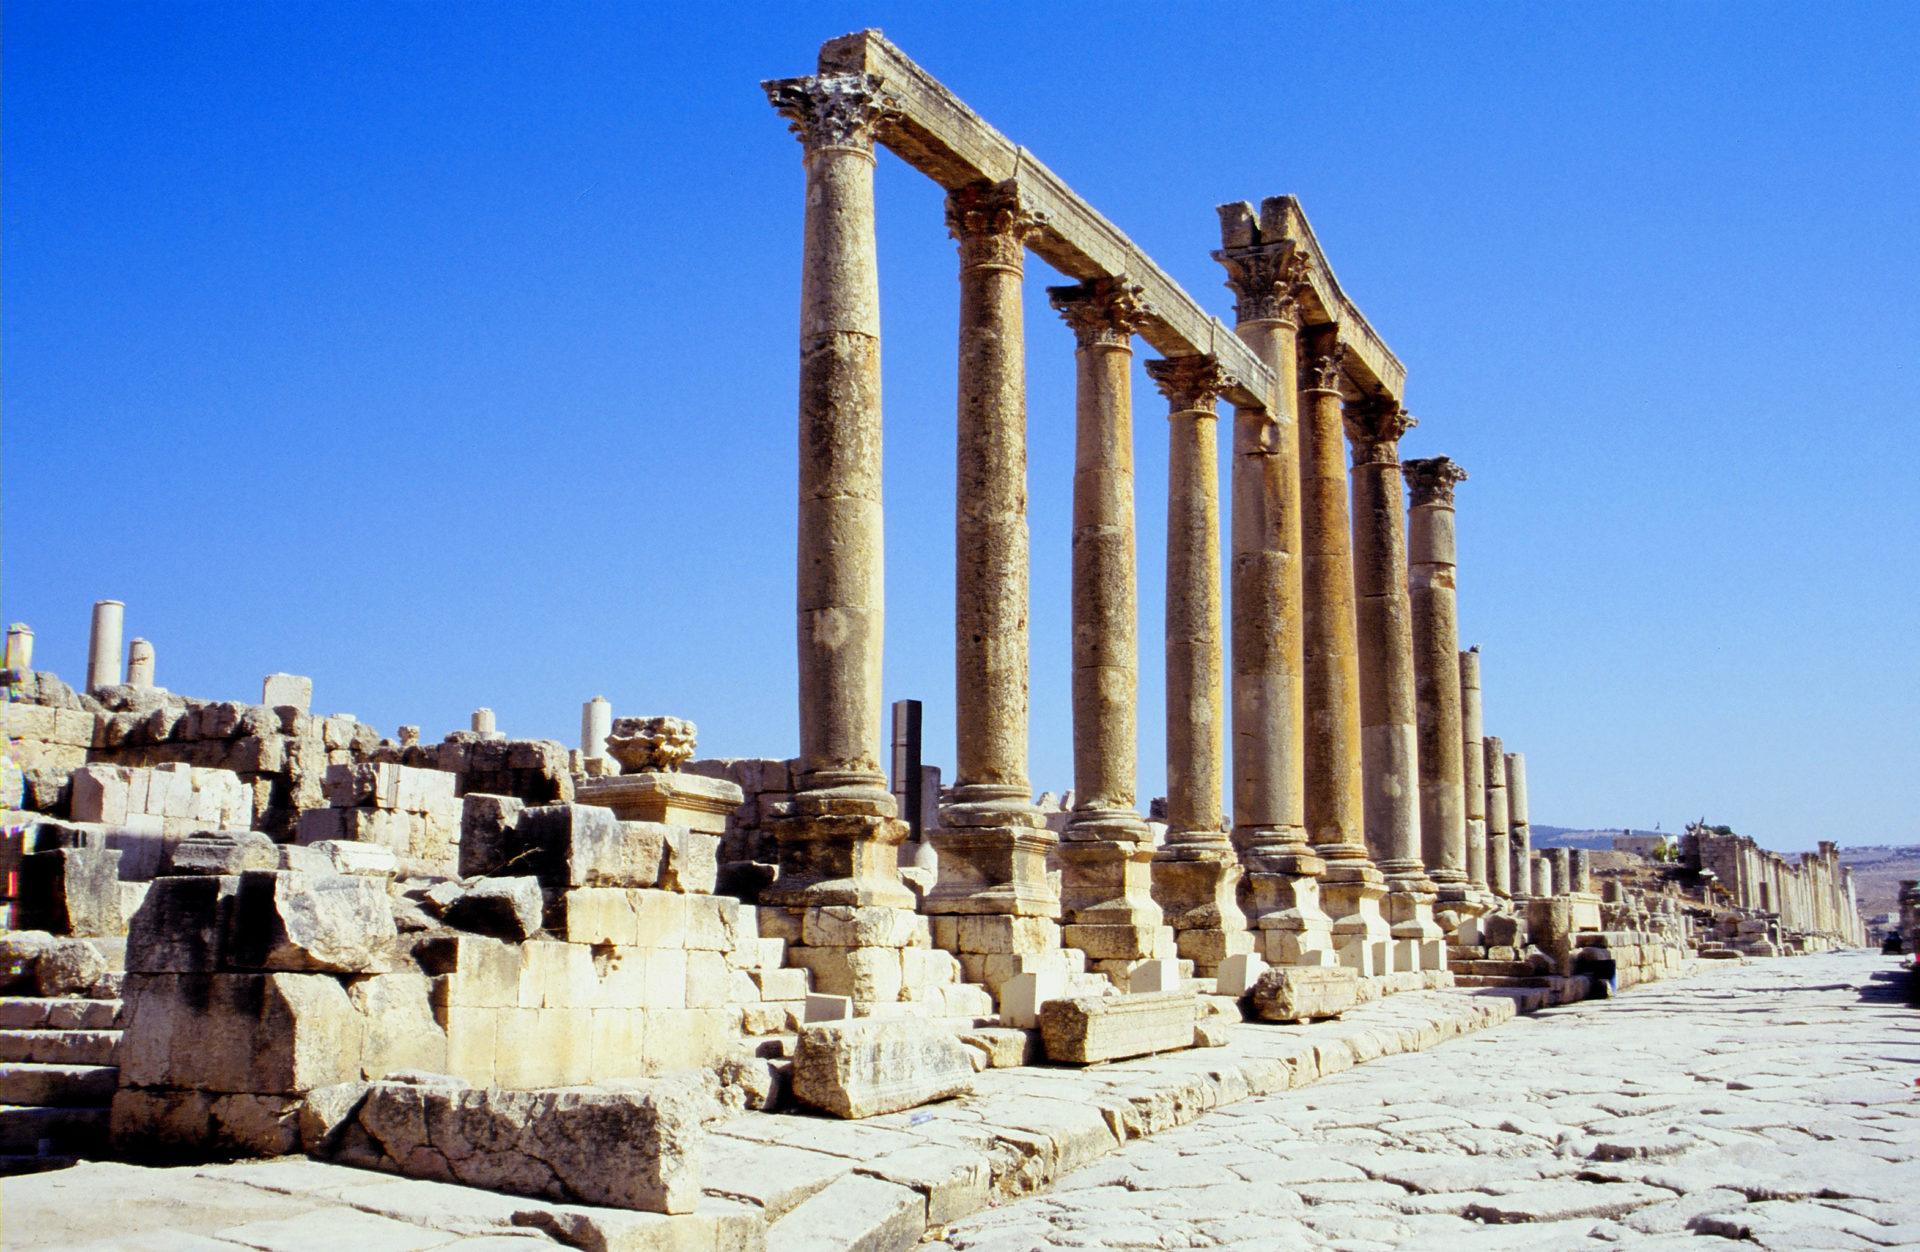 Syria 1998 # 02